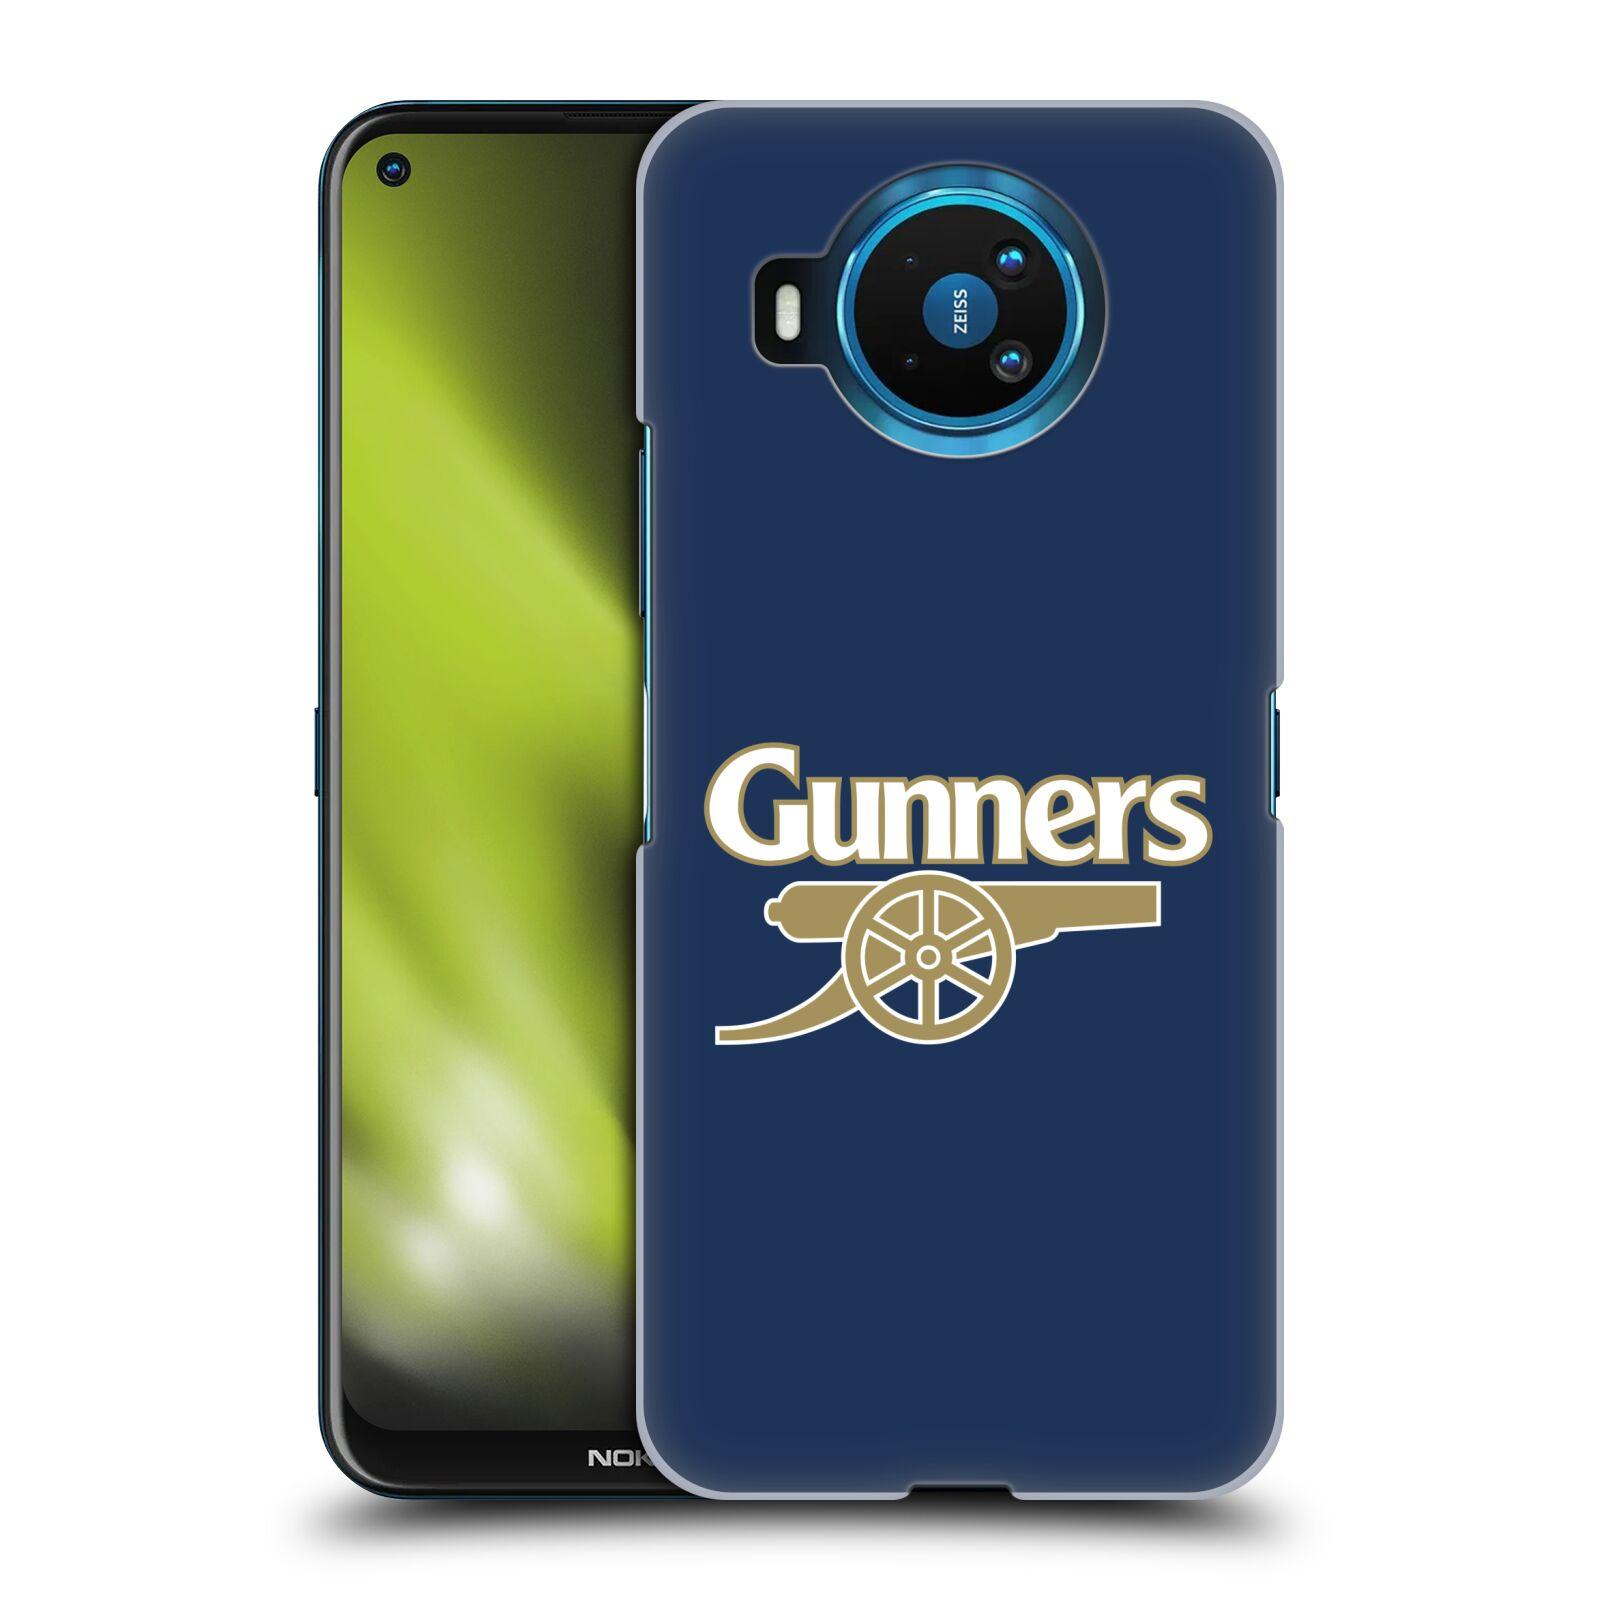 Plastové pouzdro na mobil Nokia 8.3 5G - Head Case - Arsenal FC - Gunners